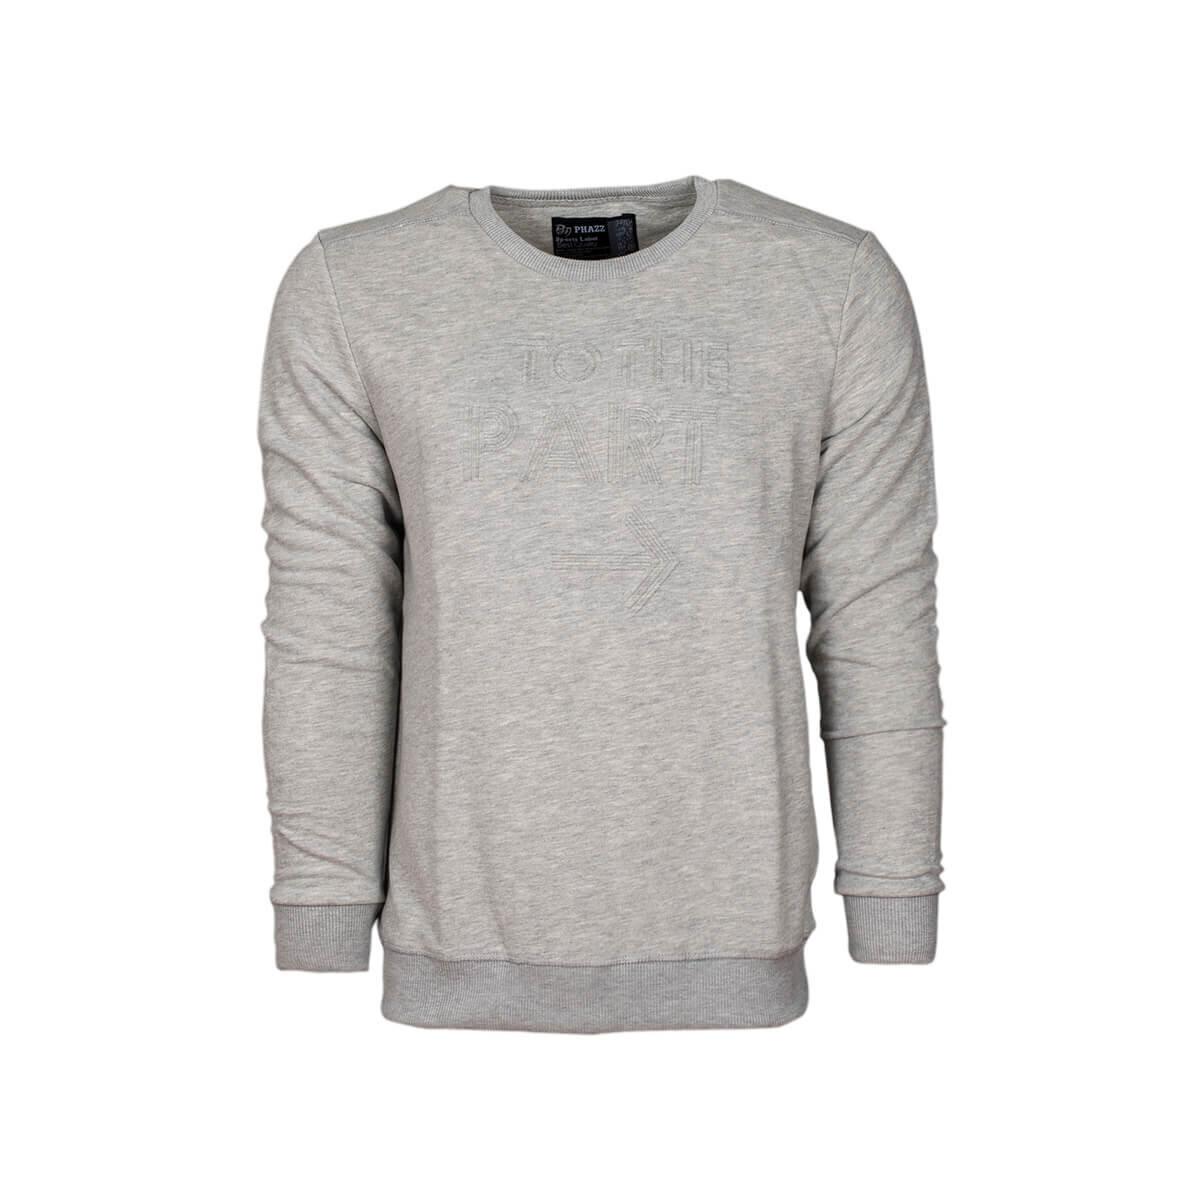 Gri Mel Erkek Sweatshirt 85310